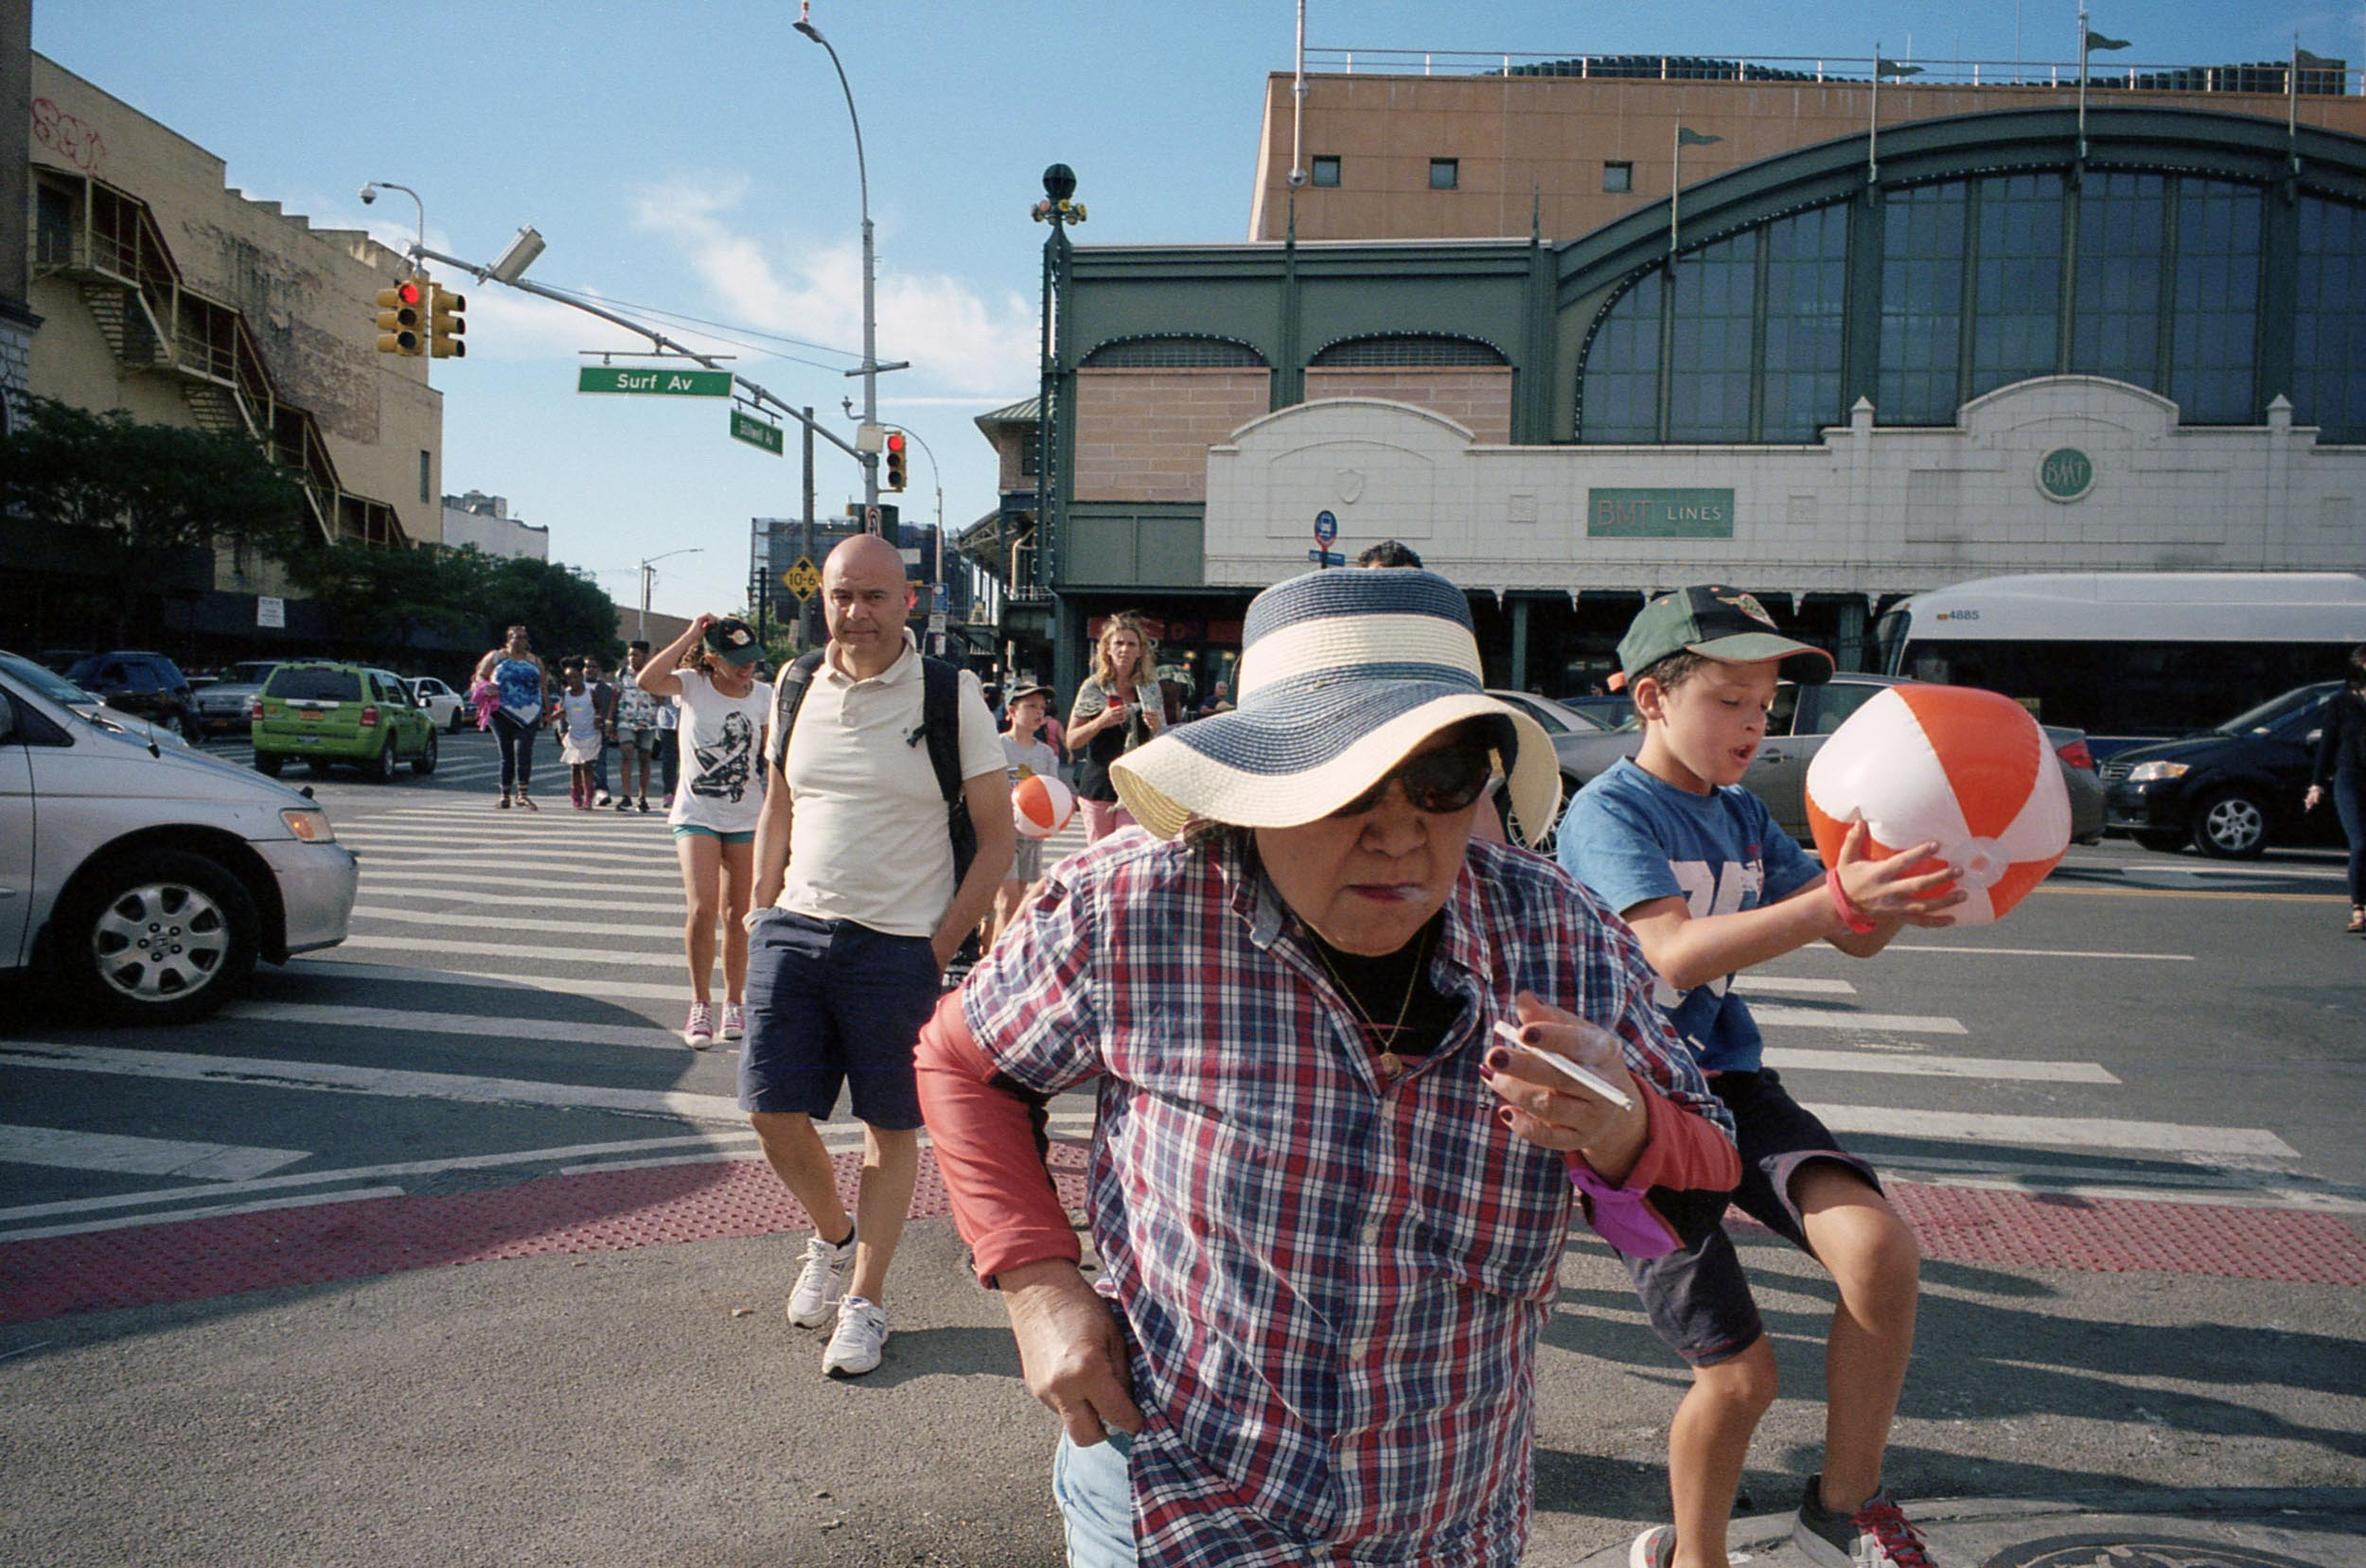 new-york-city-street-photography-Sebastian-Siadecki-3